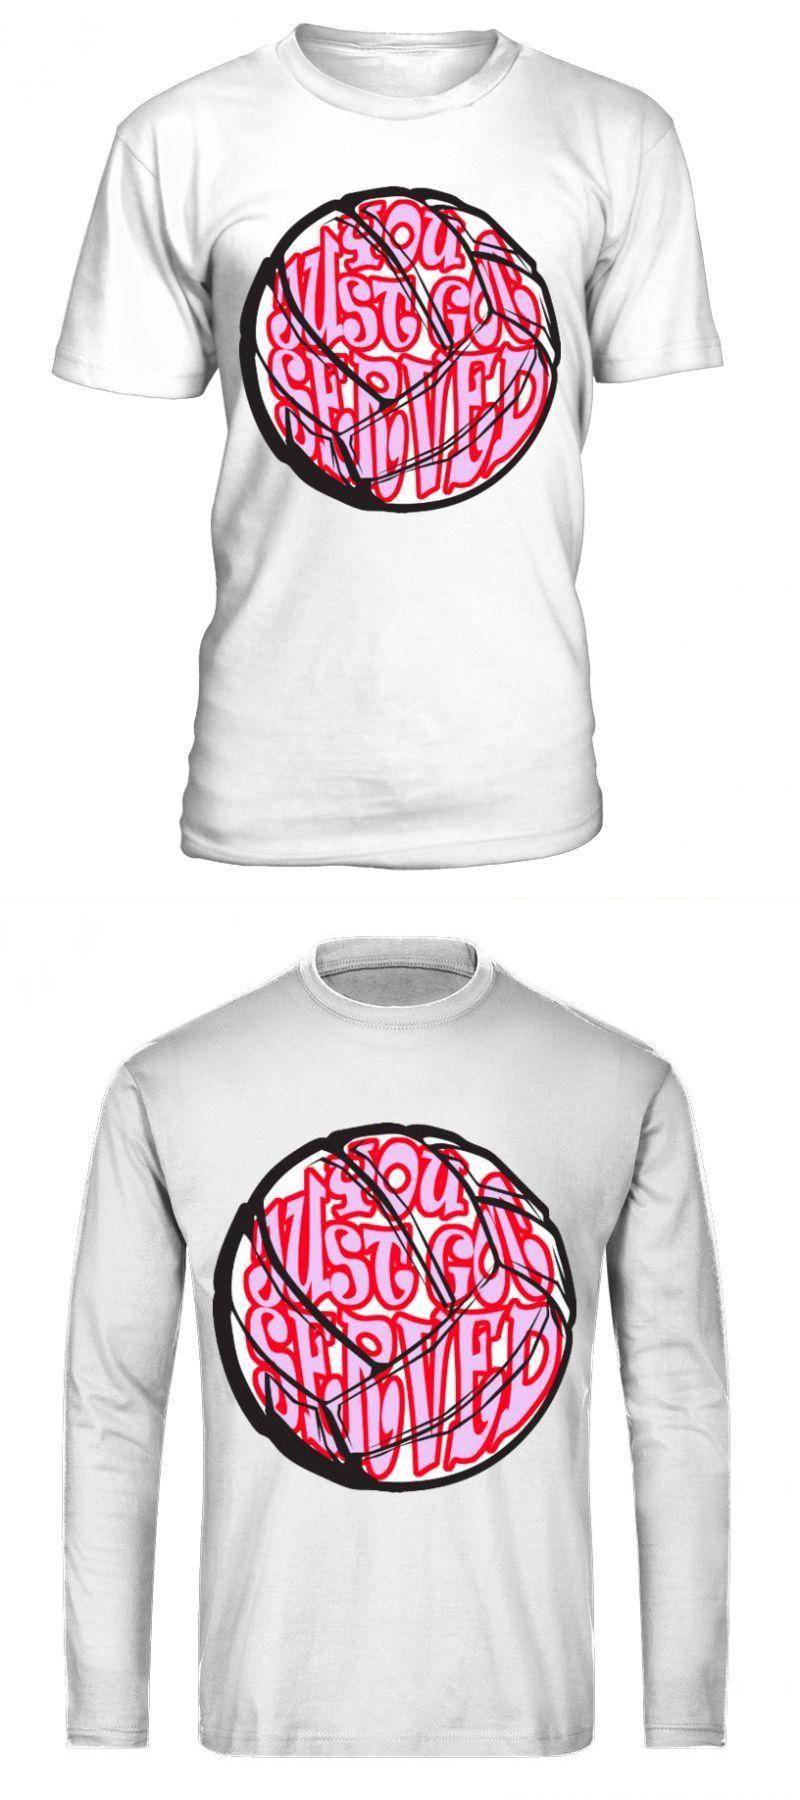 Volleyball Camp T Shirt Just Got Served T Shirts For Volleyball Team Volleyball Camp Shirt Just Got Served T Volleyball Camp Volleyball Team Volleyball